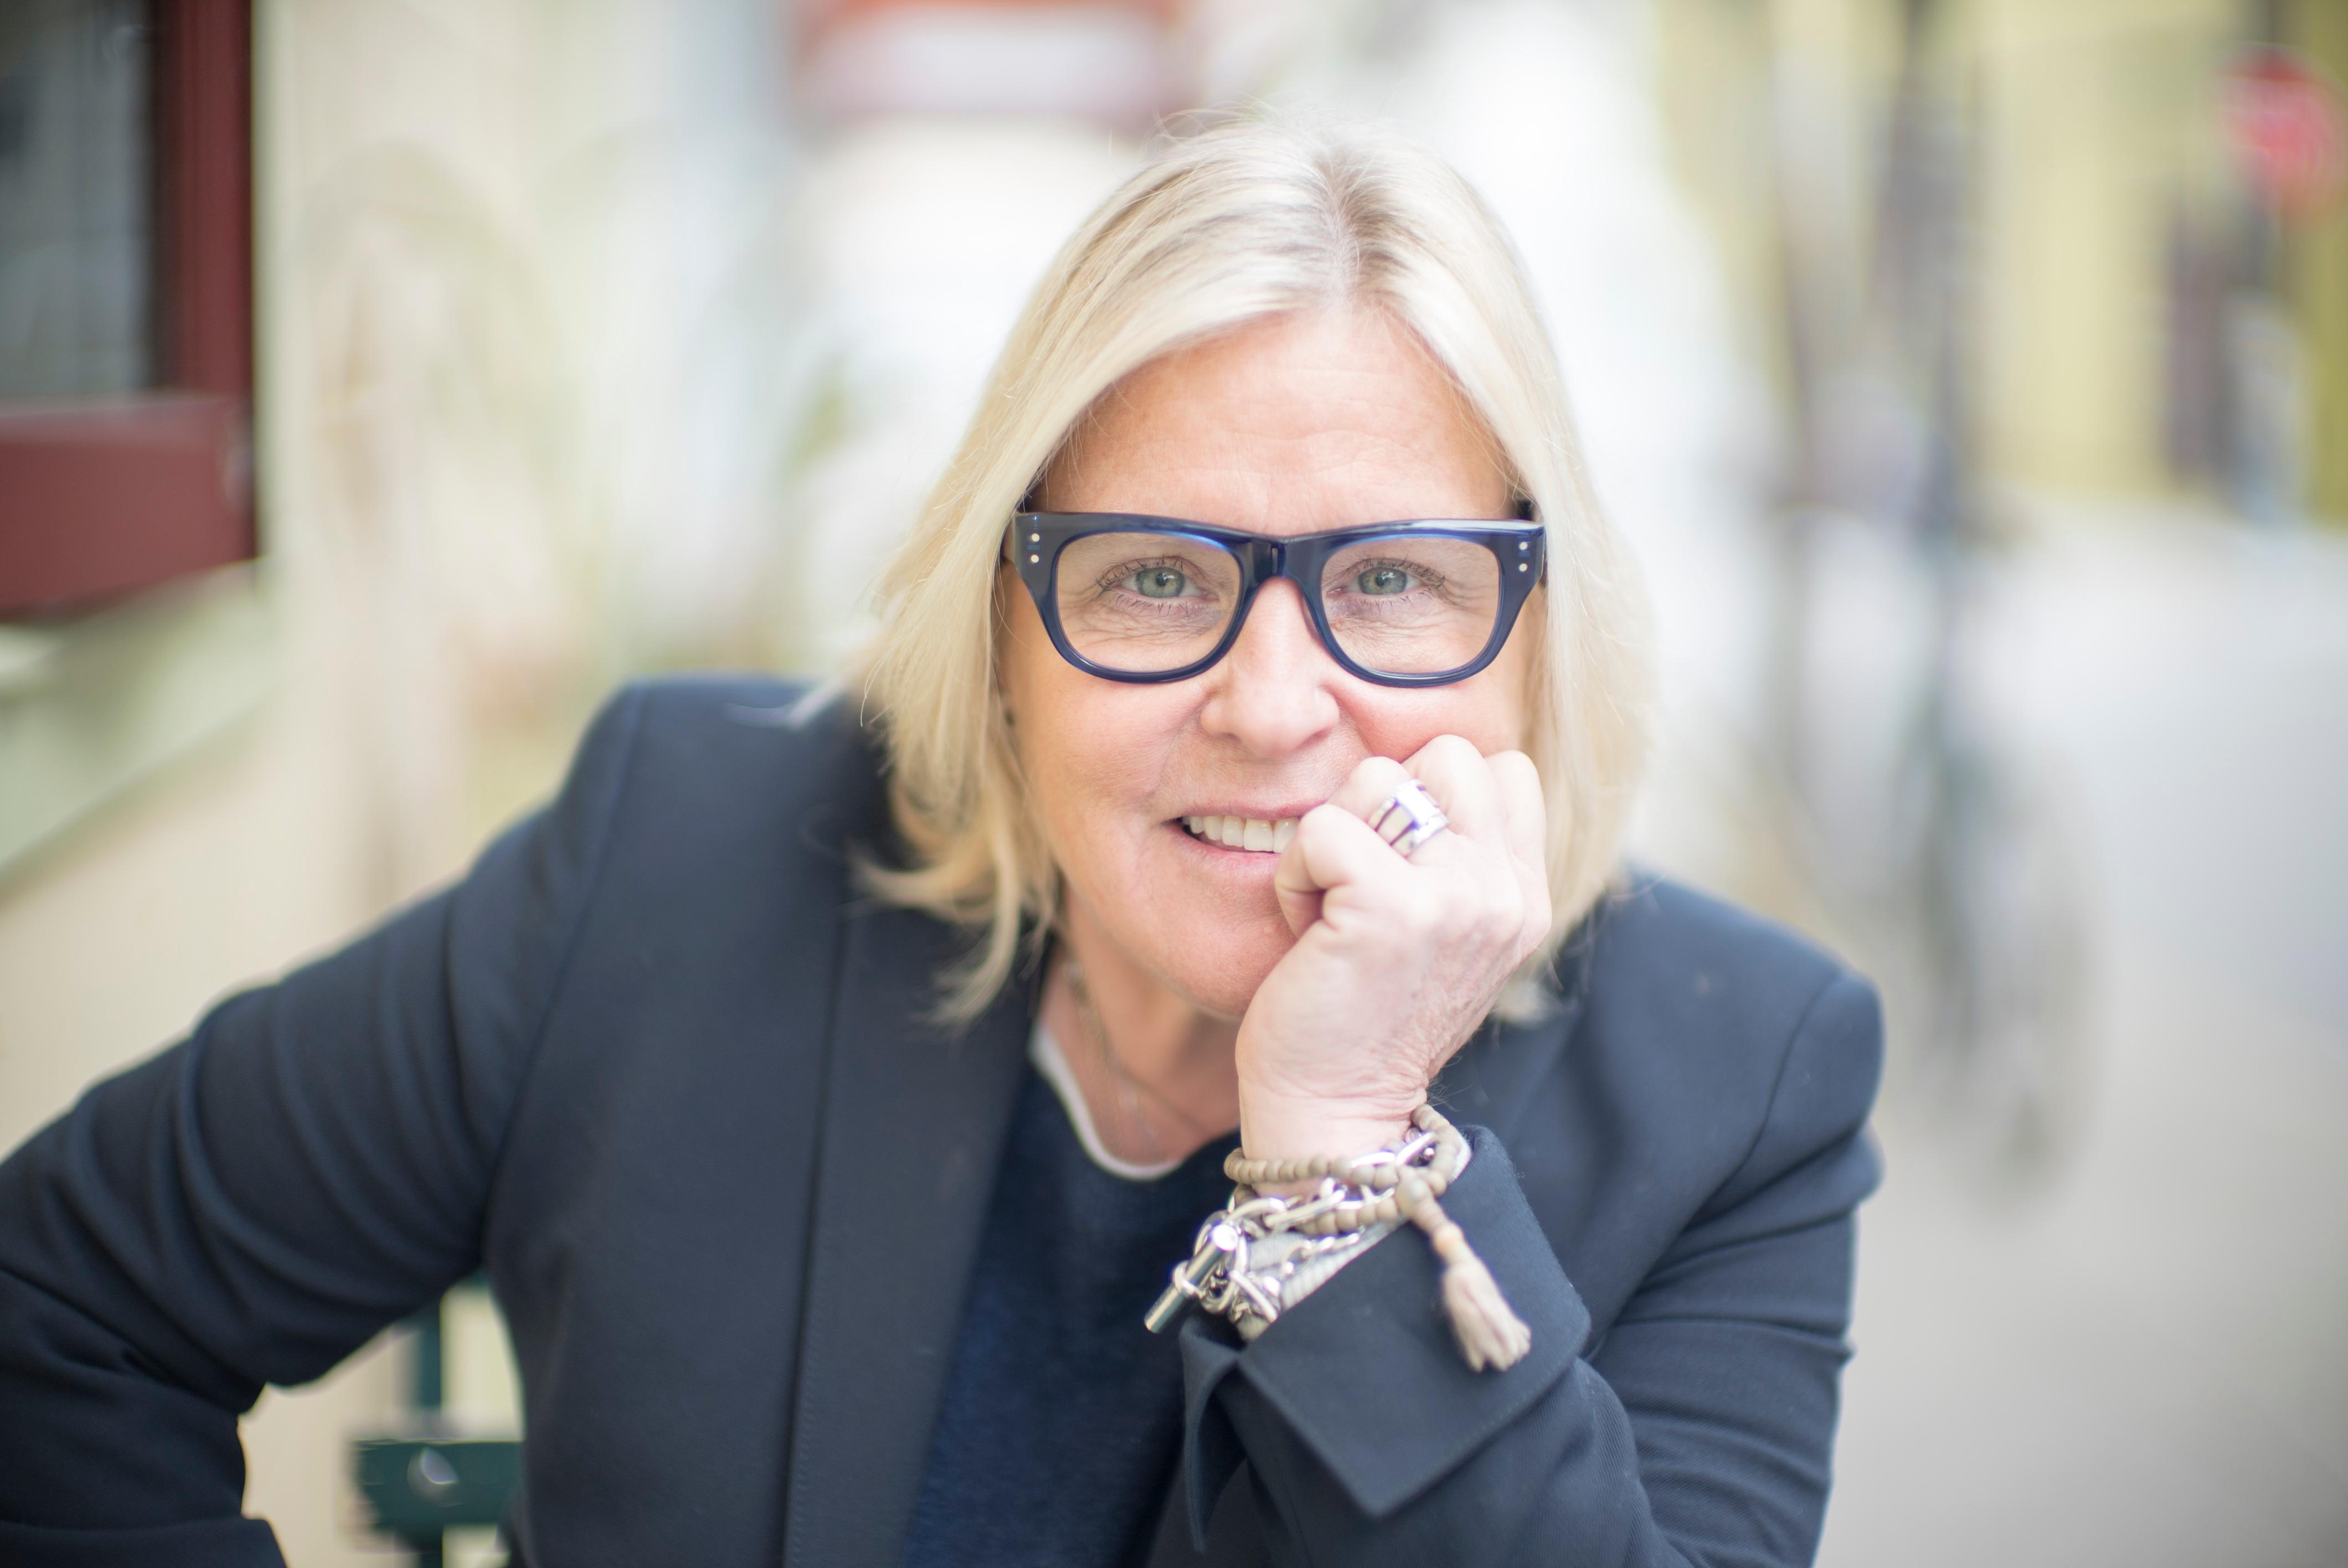 Amy Errett, CEO of Madison Reed